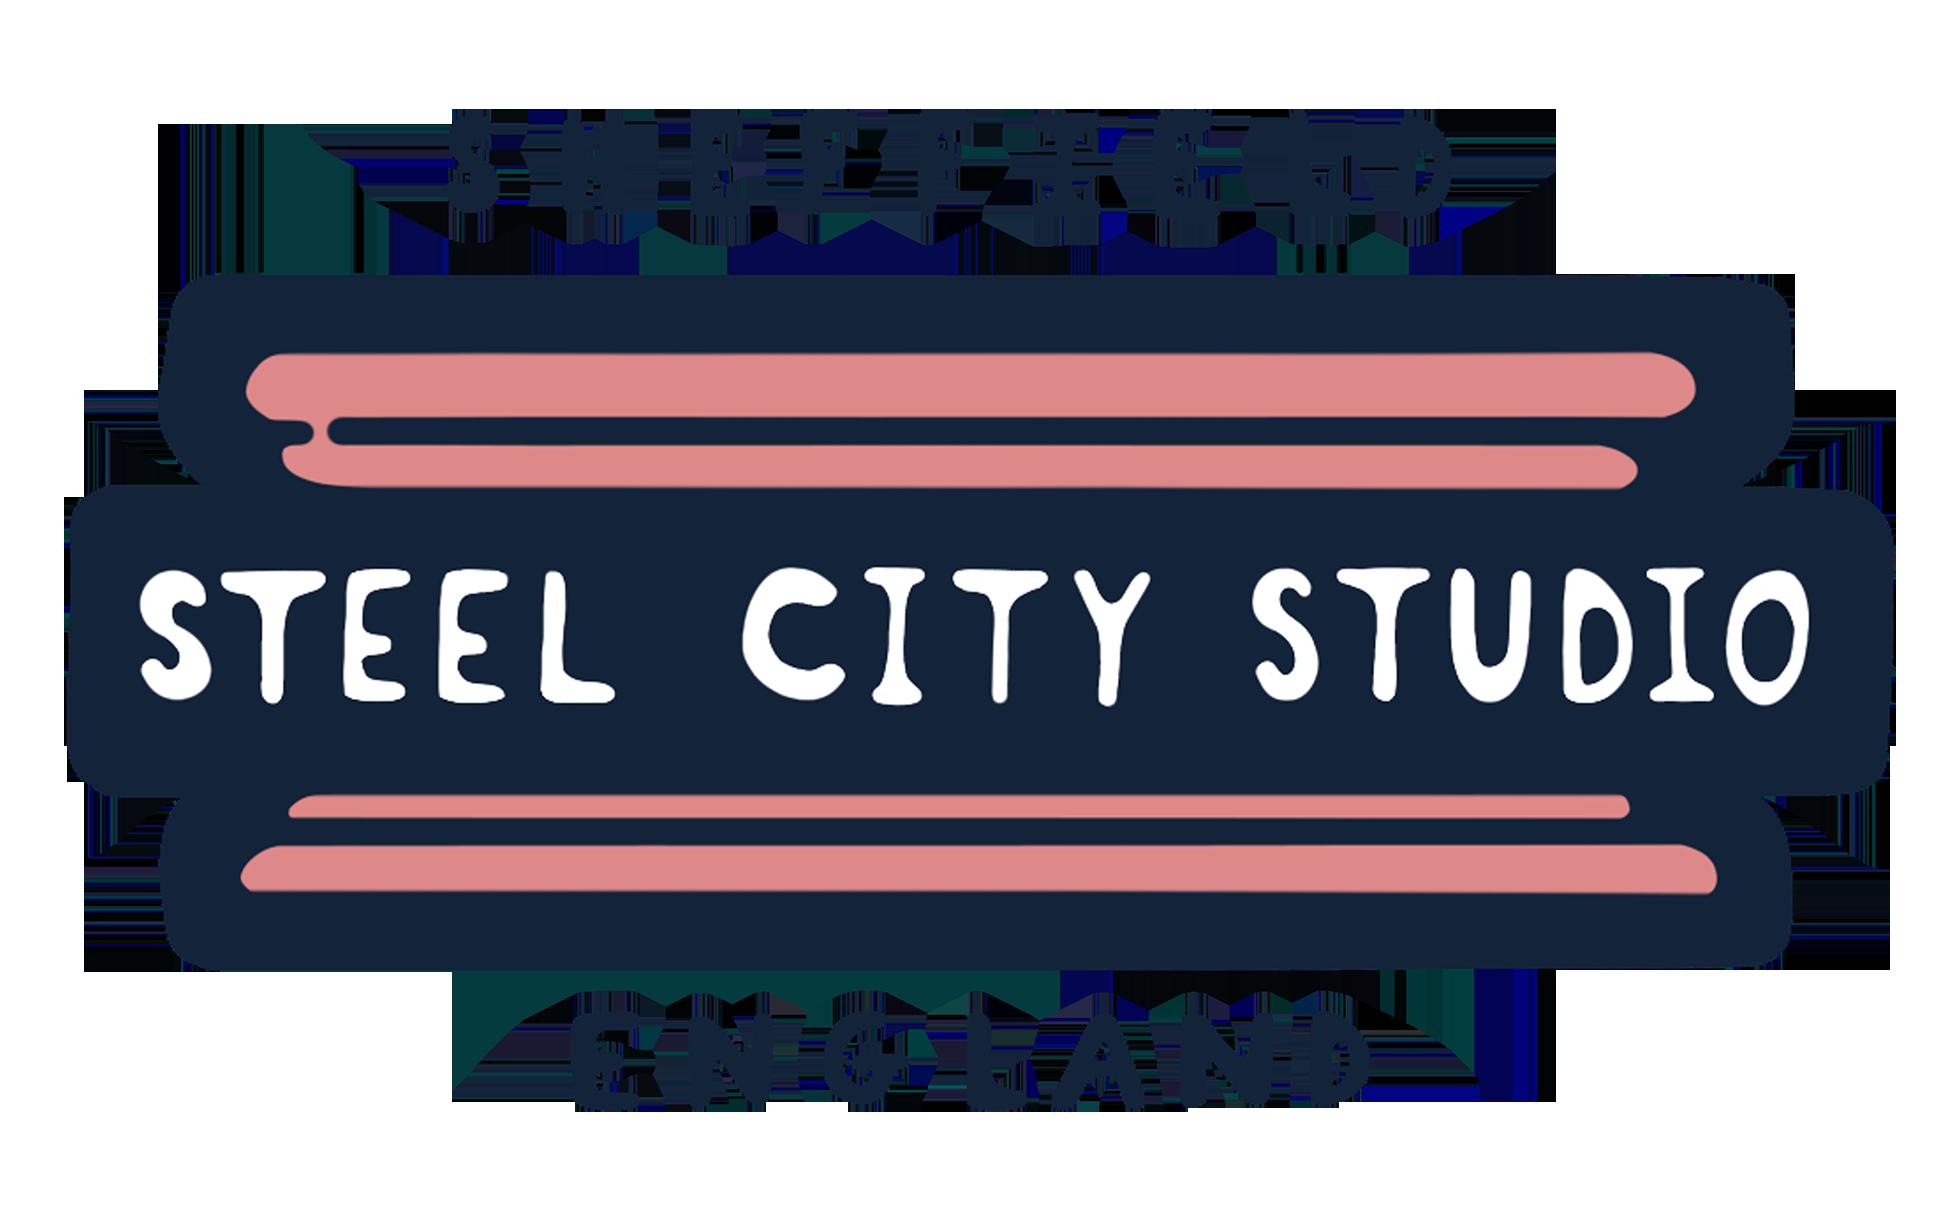 Steel City Studio